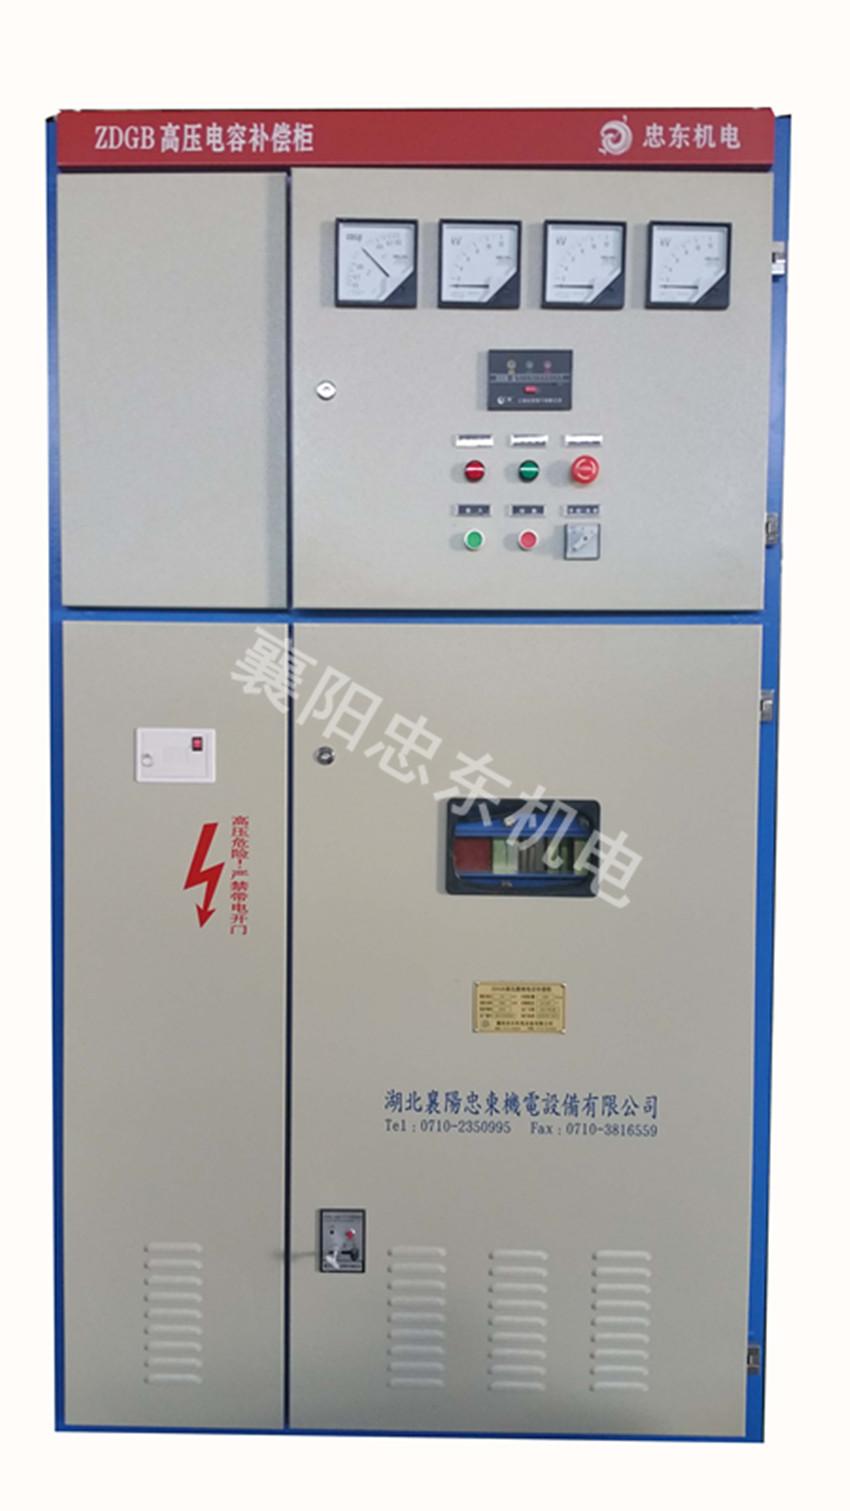 ZDGB高压就地电容补偿柜